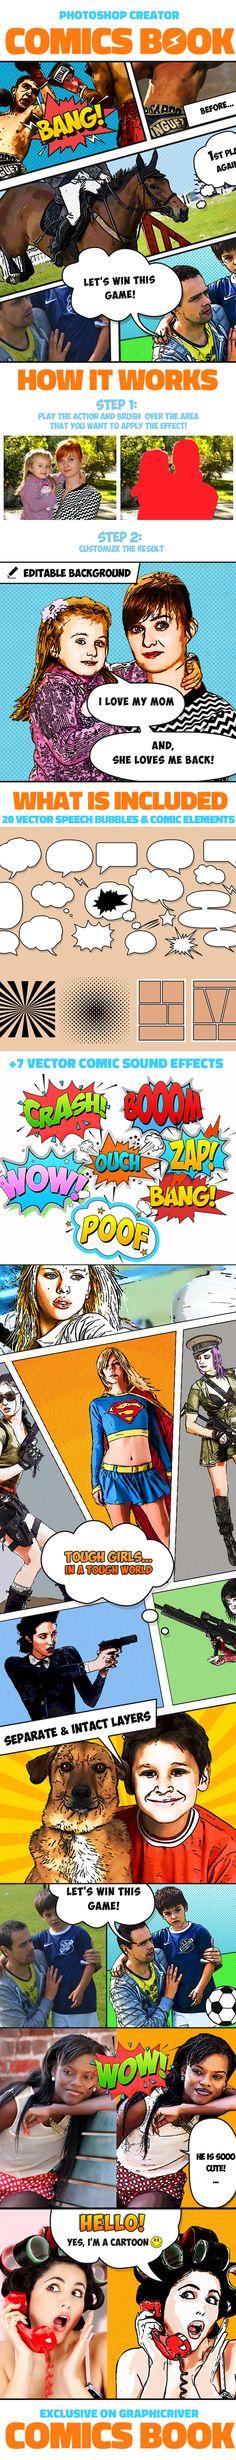 Comics Book Photoshop Creator. Download here: http://graphicriver.net/item/comics-book-photoshop-creator/15455074?ref=ksioks